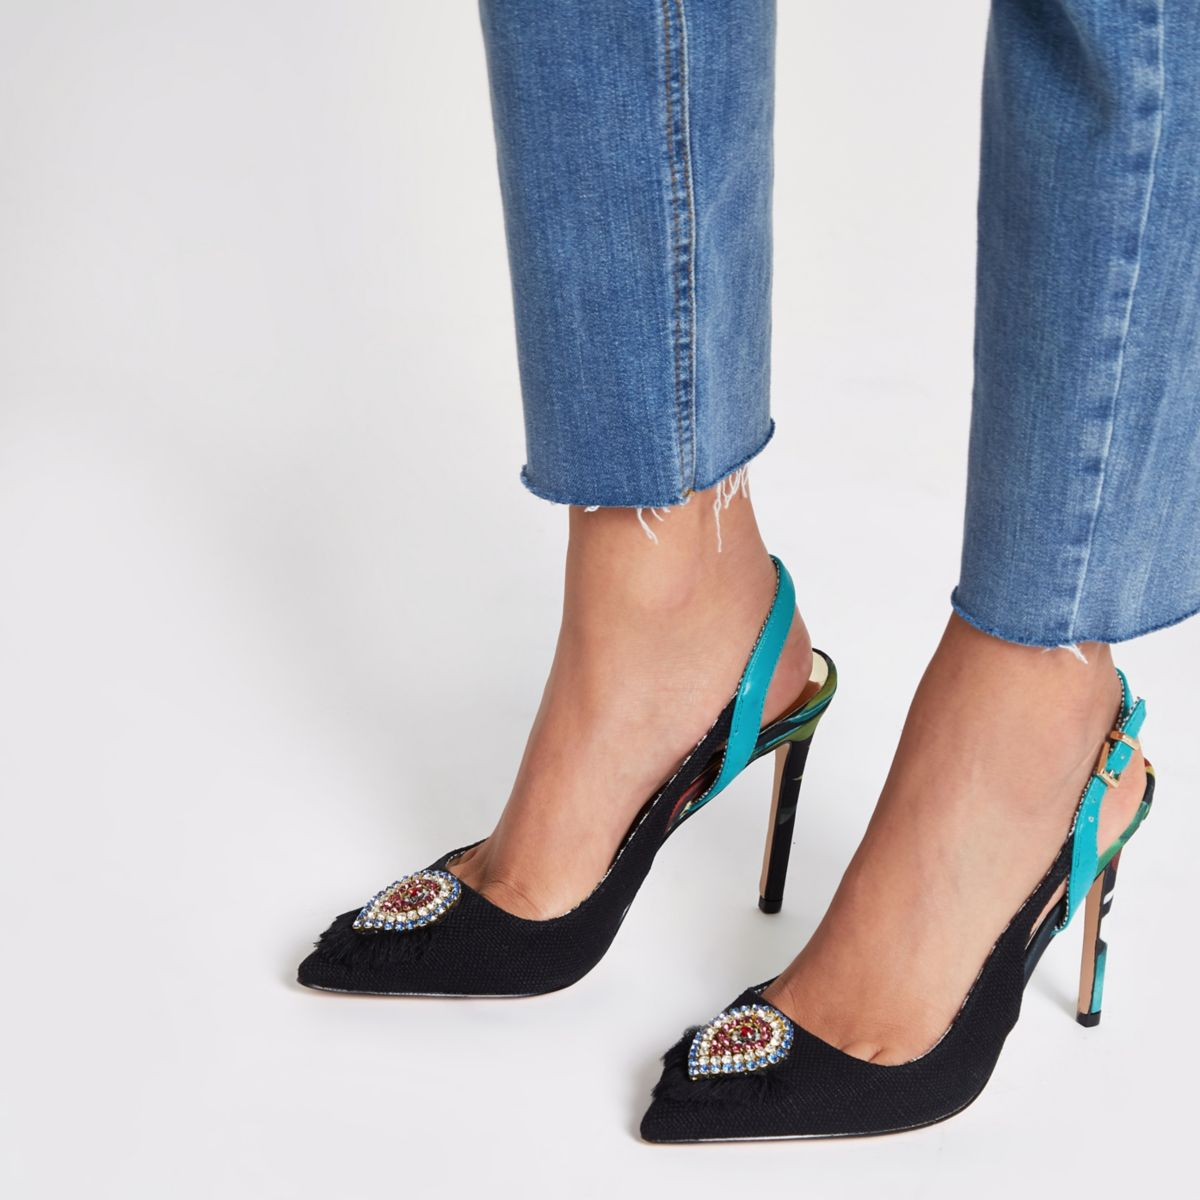 Black Jewel Embellished Slingback Court Shoes by River Island